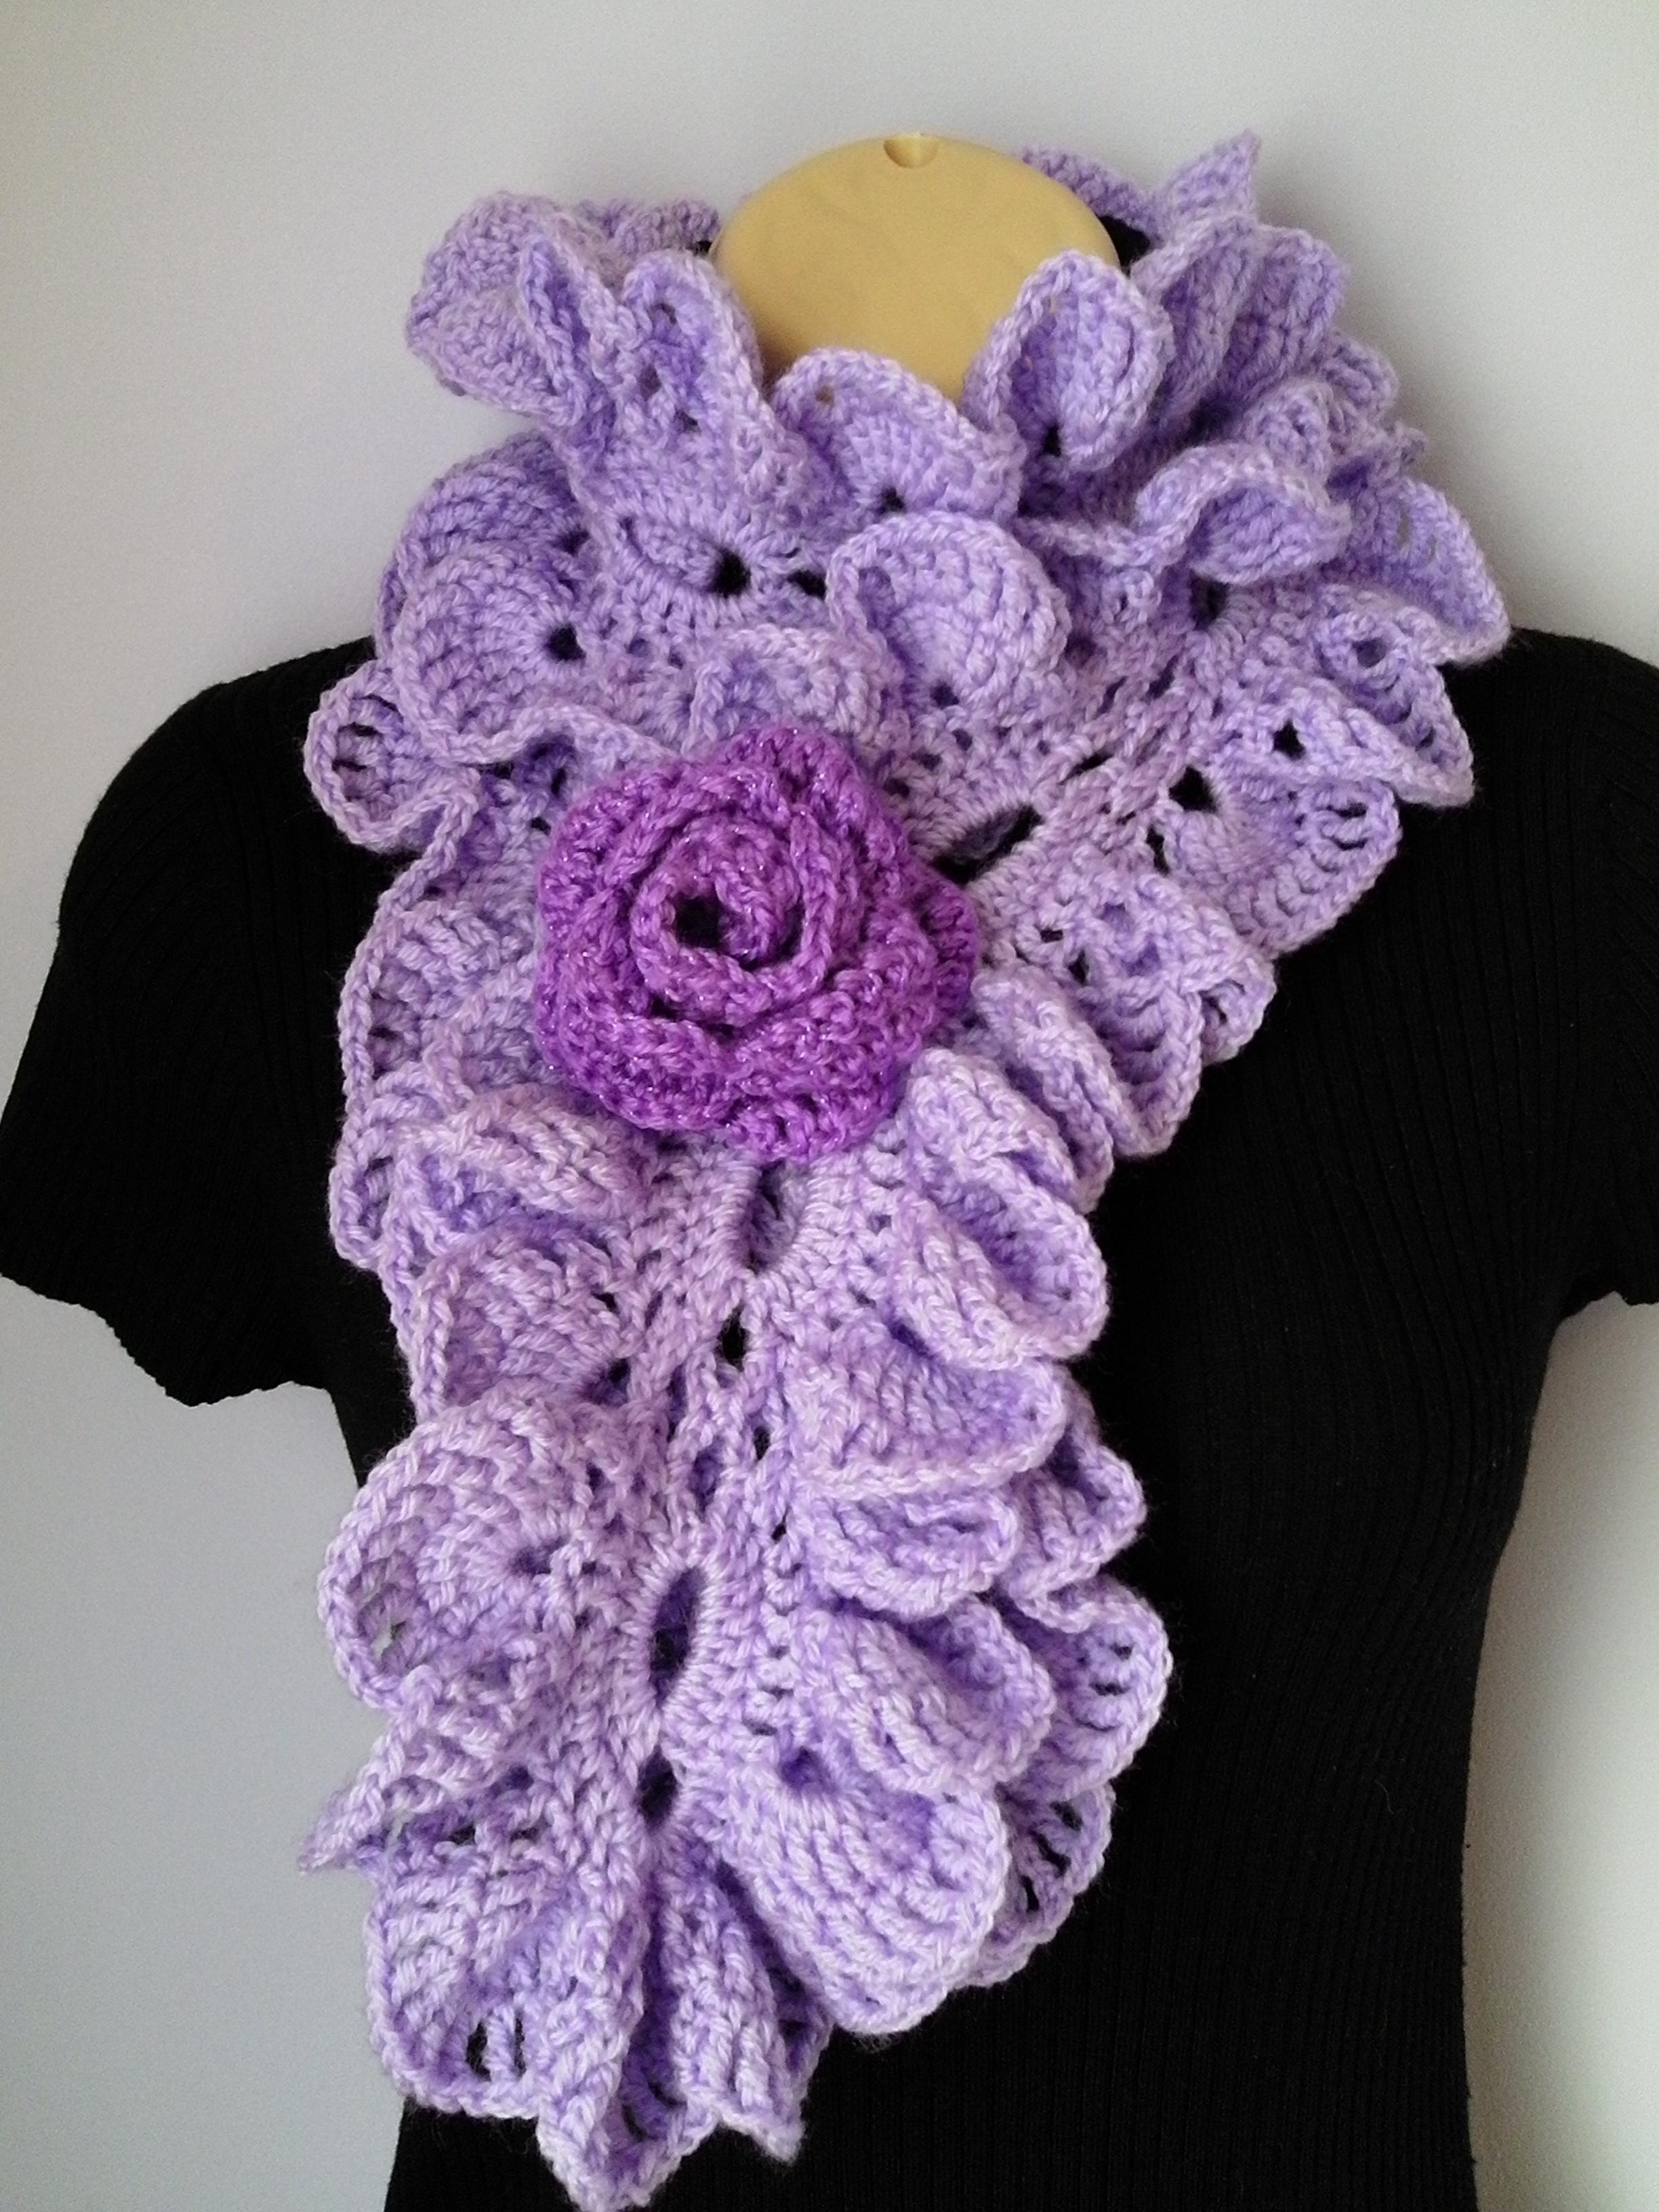 Tatjanaboutique Crochet Scarf With Flower Brooch Neckwarmer